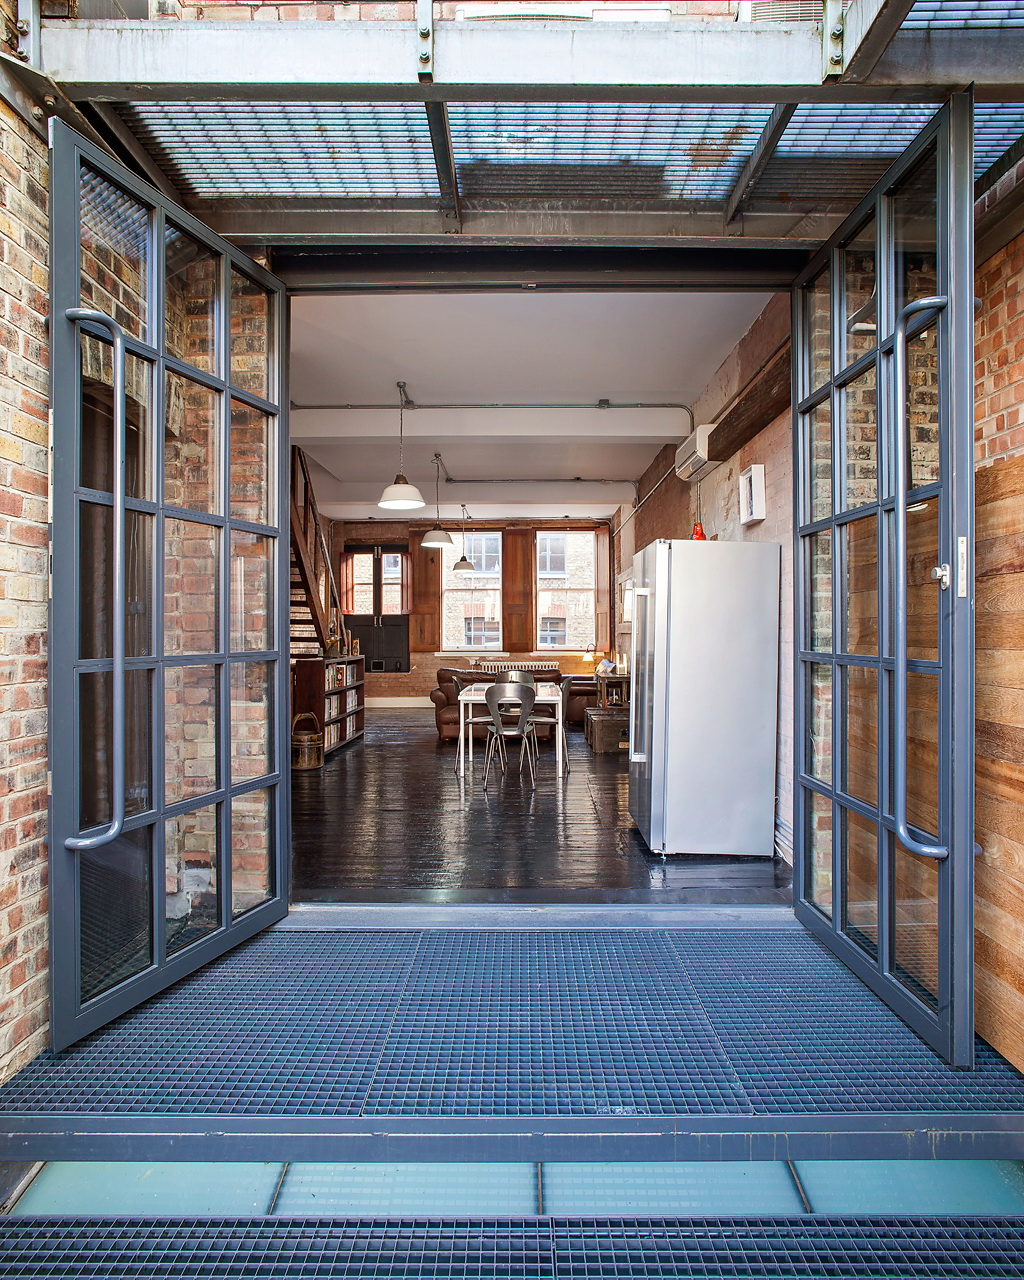 Chris-Dyson-Architects-Shoreditch-Warehouse-Conversion-1